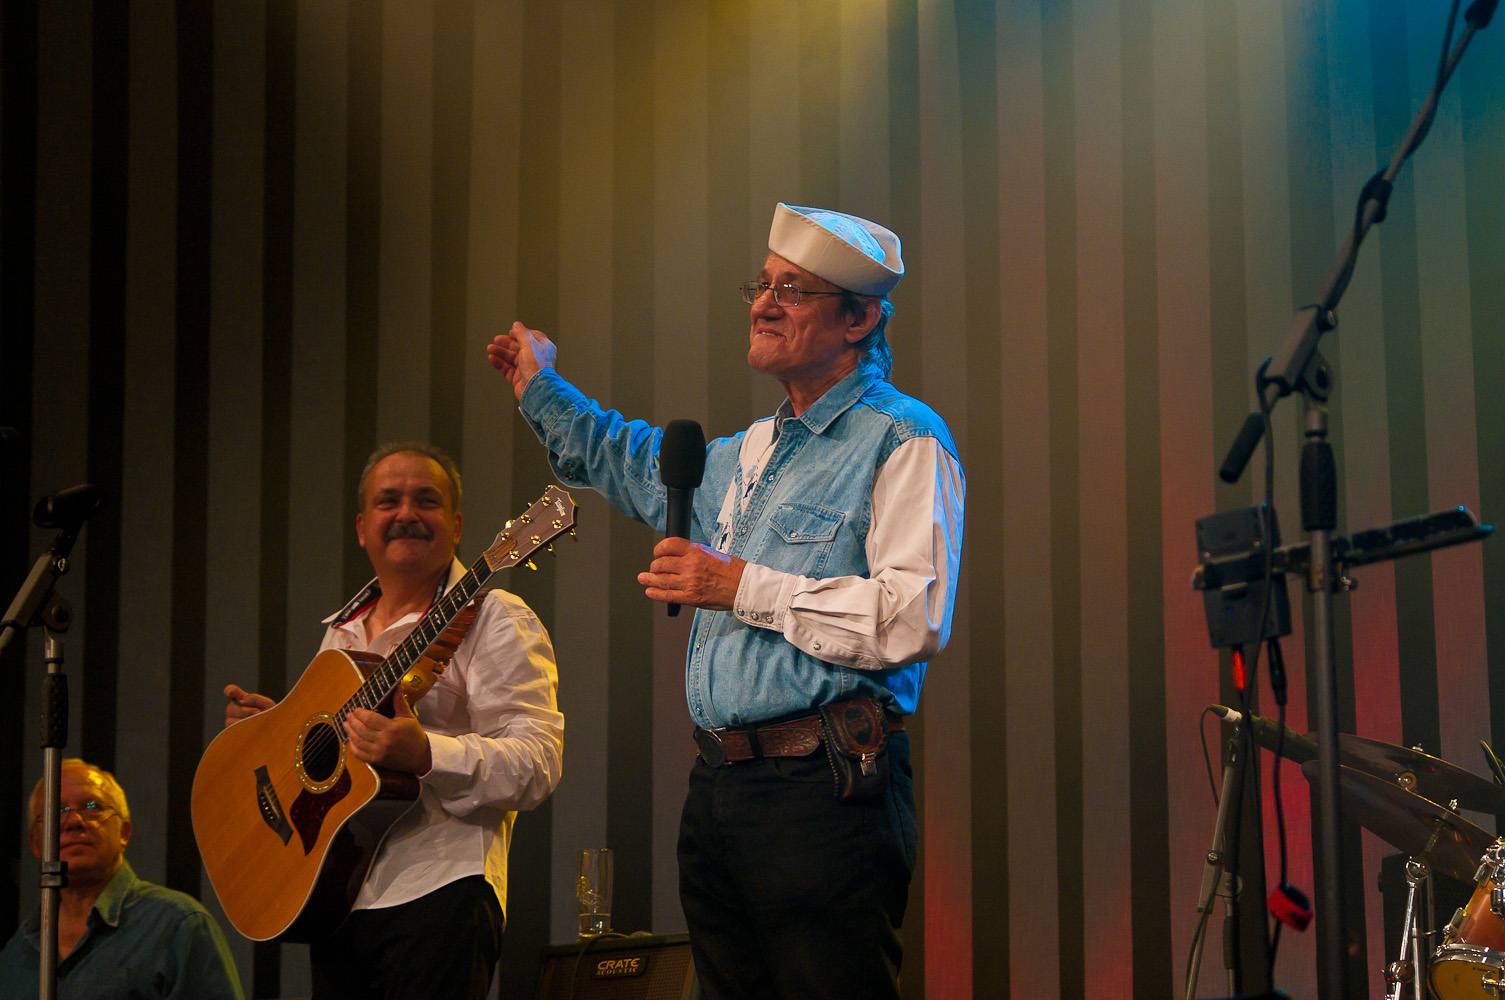 Honza Vyčítal a Medard Konopík, koncert Honzy Vyčítala a skupiny Greenhorns, Praha, Divadlo ABC 21.10.2012 (Foto: Jiří Konc / CountryWorld.cz)